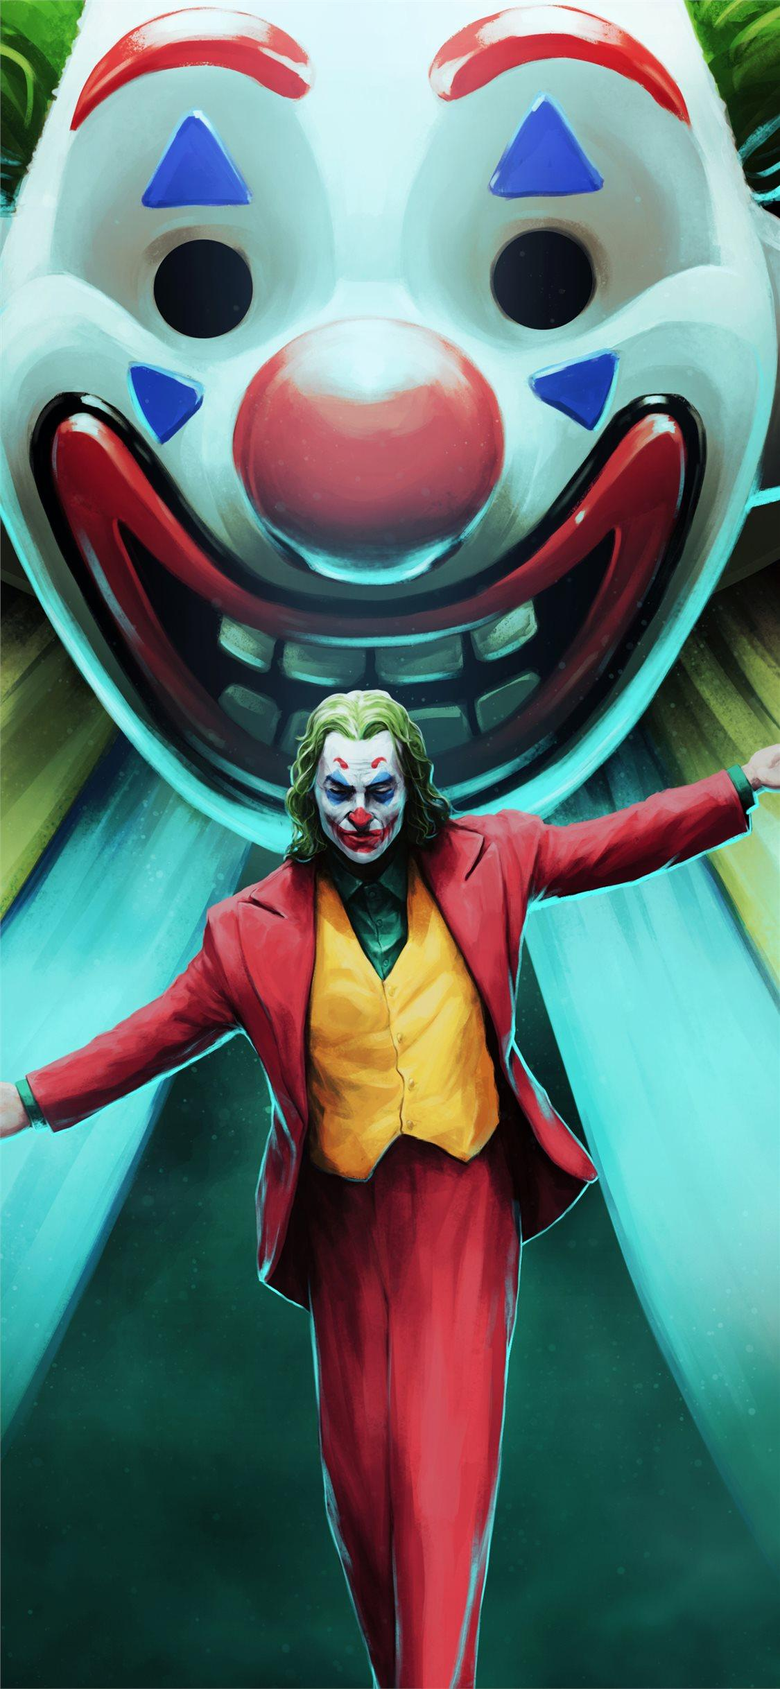 joker movie art iPhone X Wallpapers